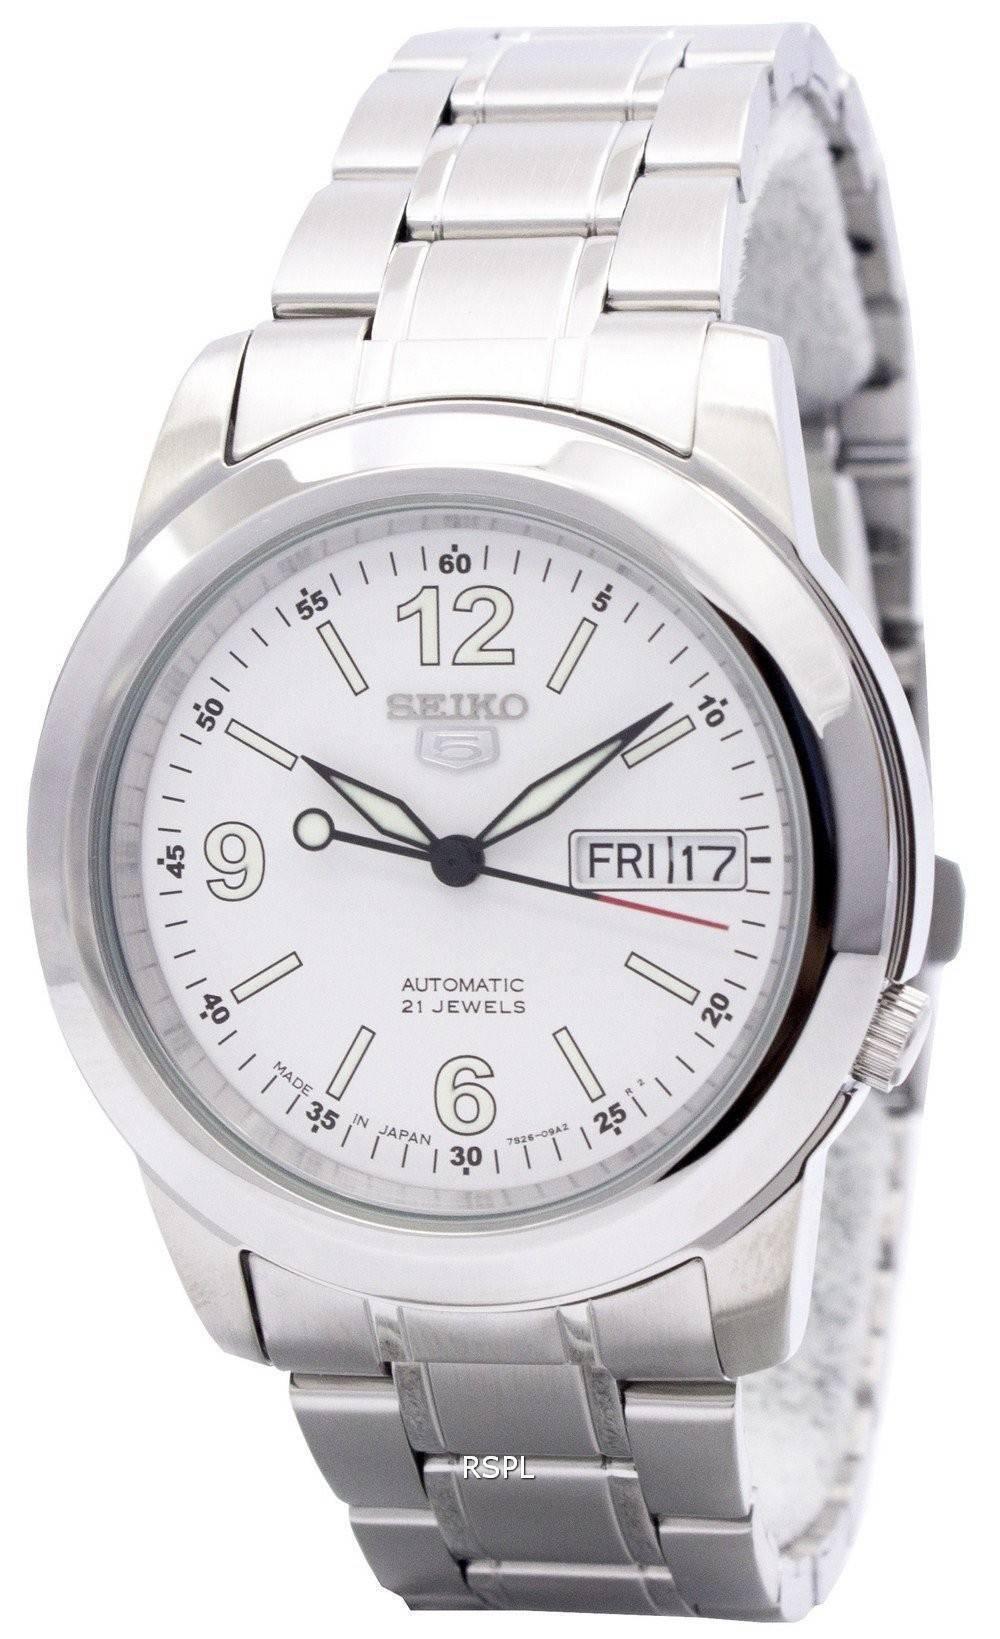 Seiko 5 Automatic 21 Jewels Japan Made SNKE57 SNKE57J1 SNKE57J Men's Watch